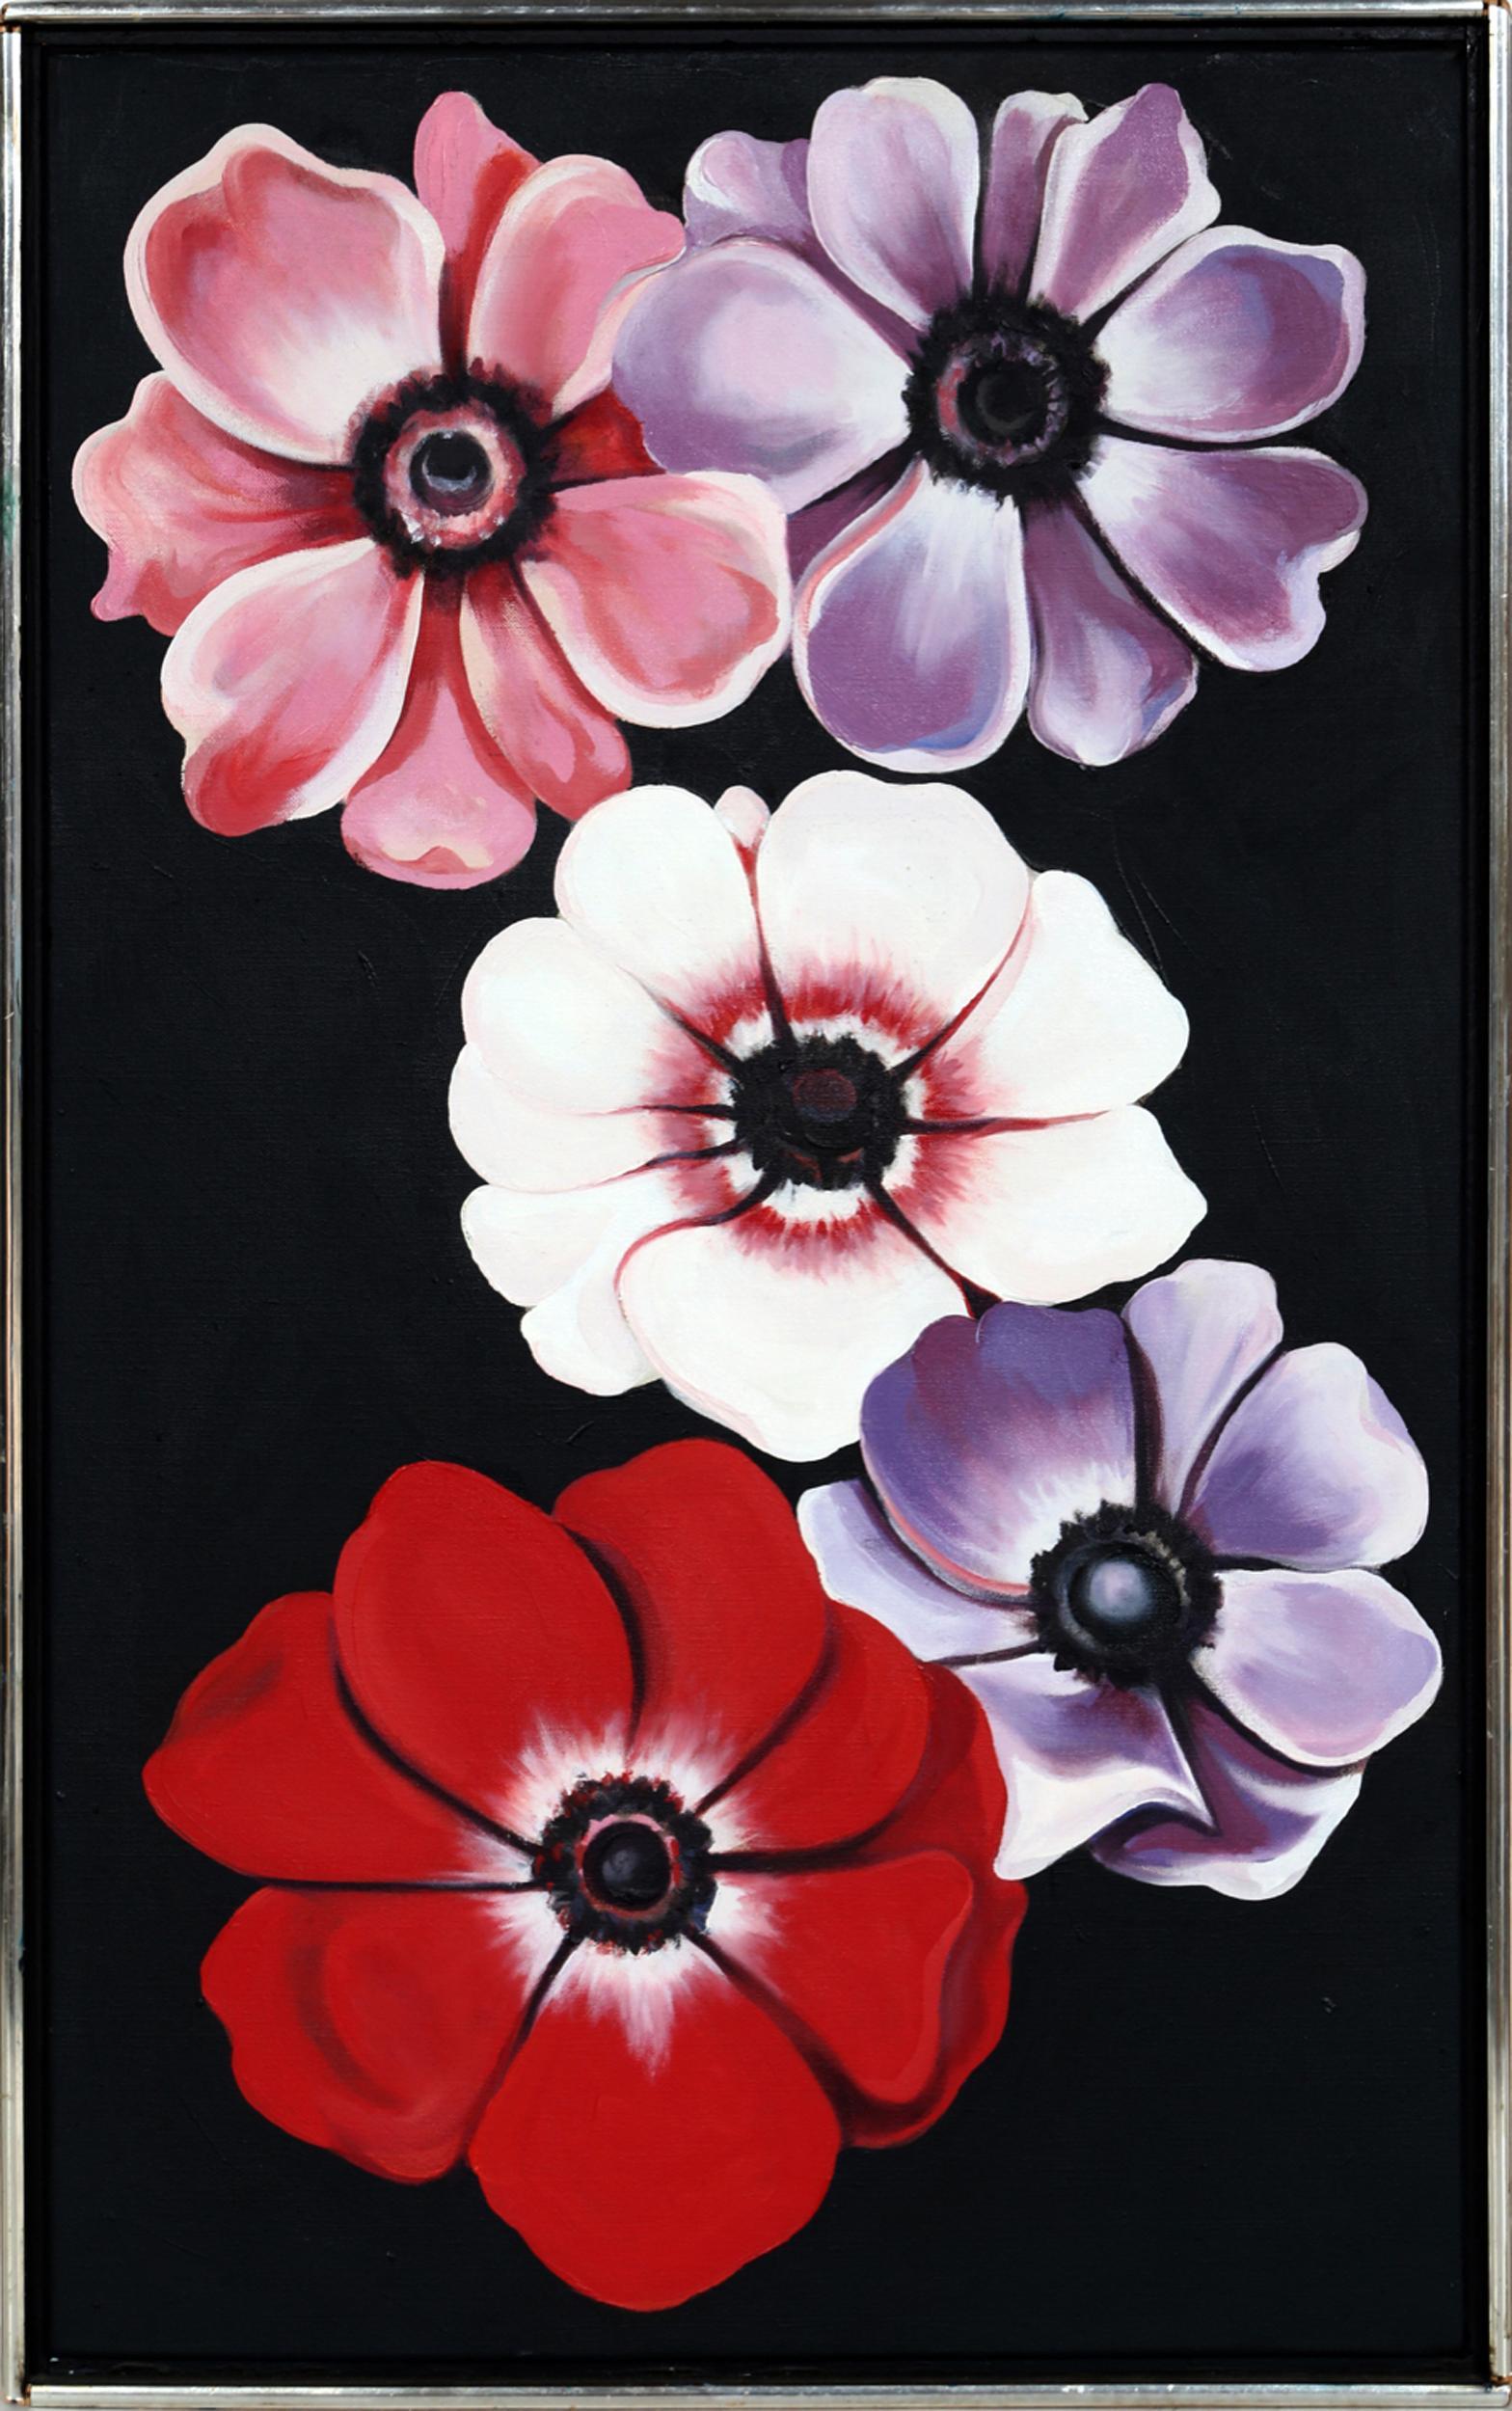 Lowell Blair Nesbitt, Five Anemones, Oil Painting